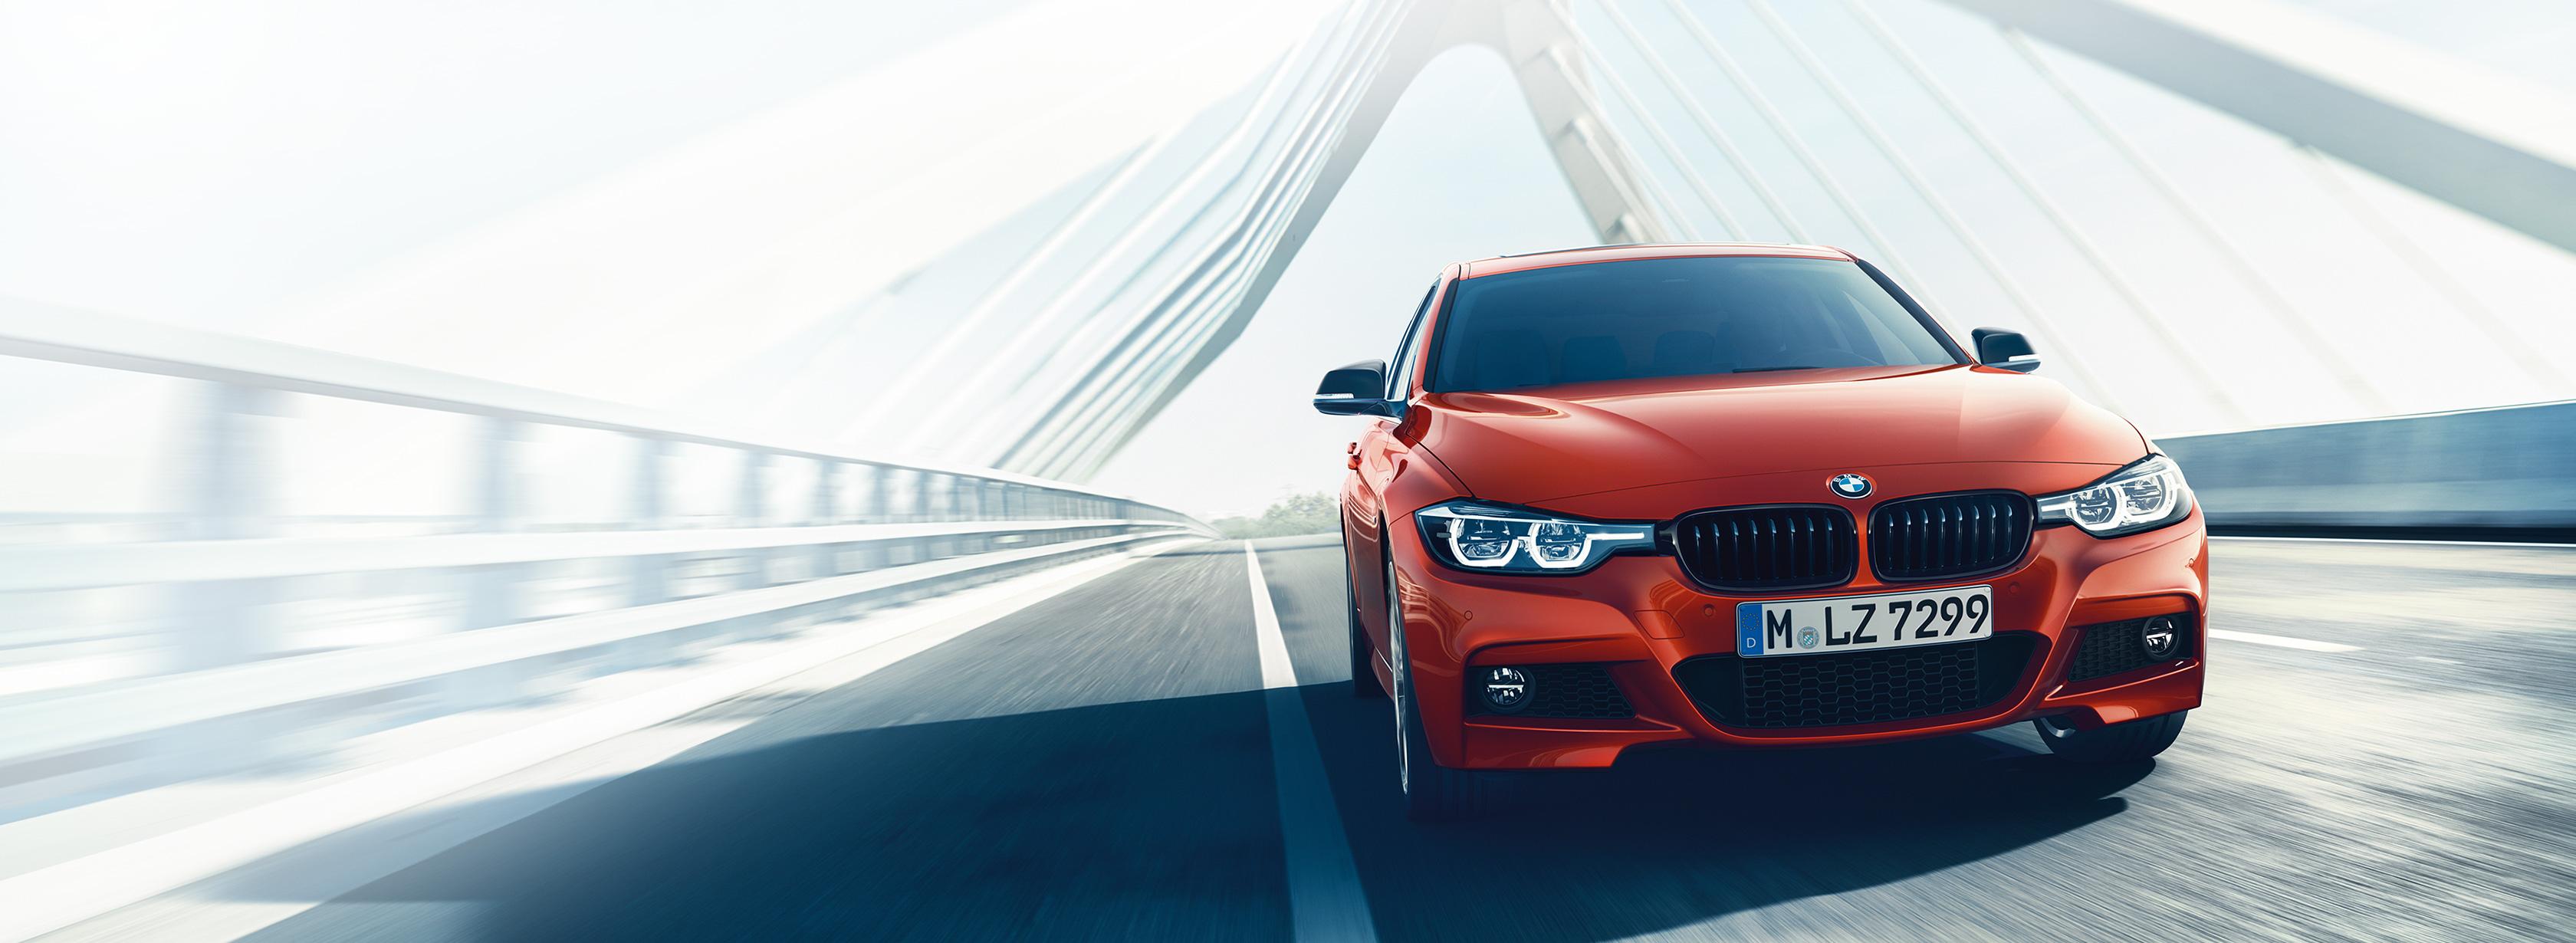 BMW Seria 3 editie limitata